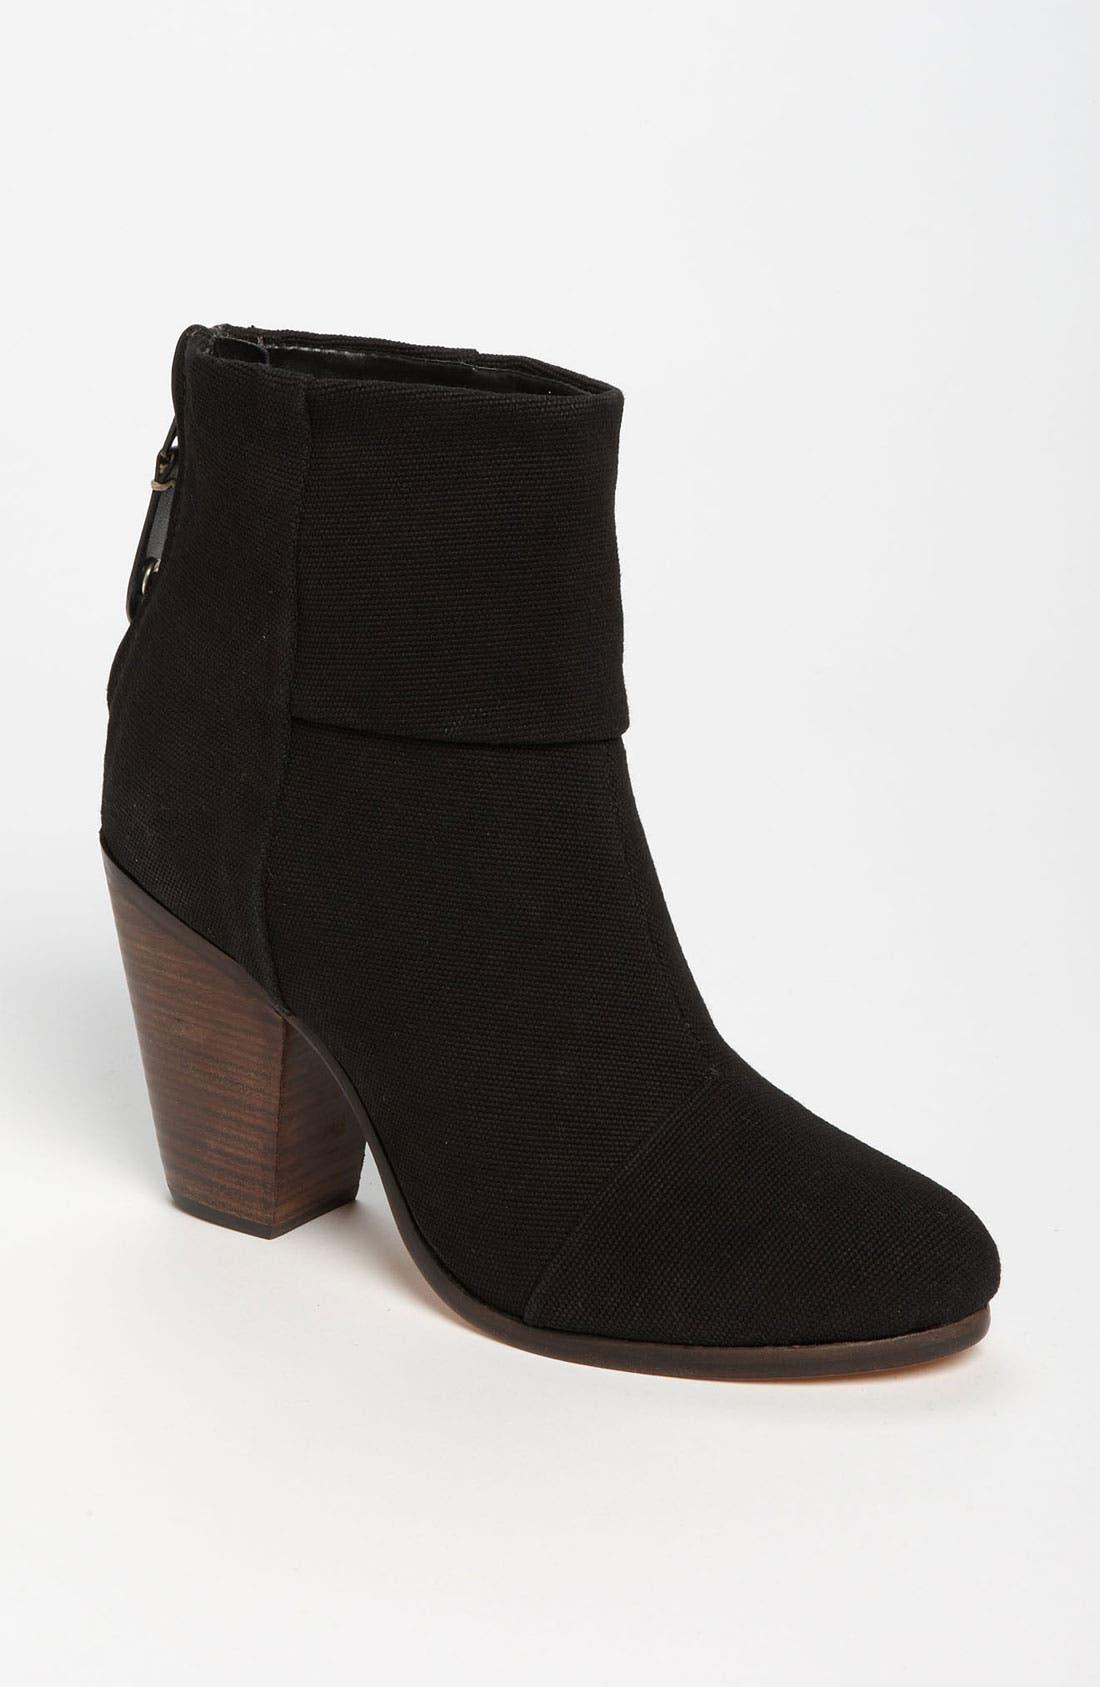 Alternate Image 1 Selected - rag & bone 'Newbury' Boot (Online Only)